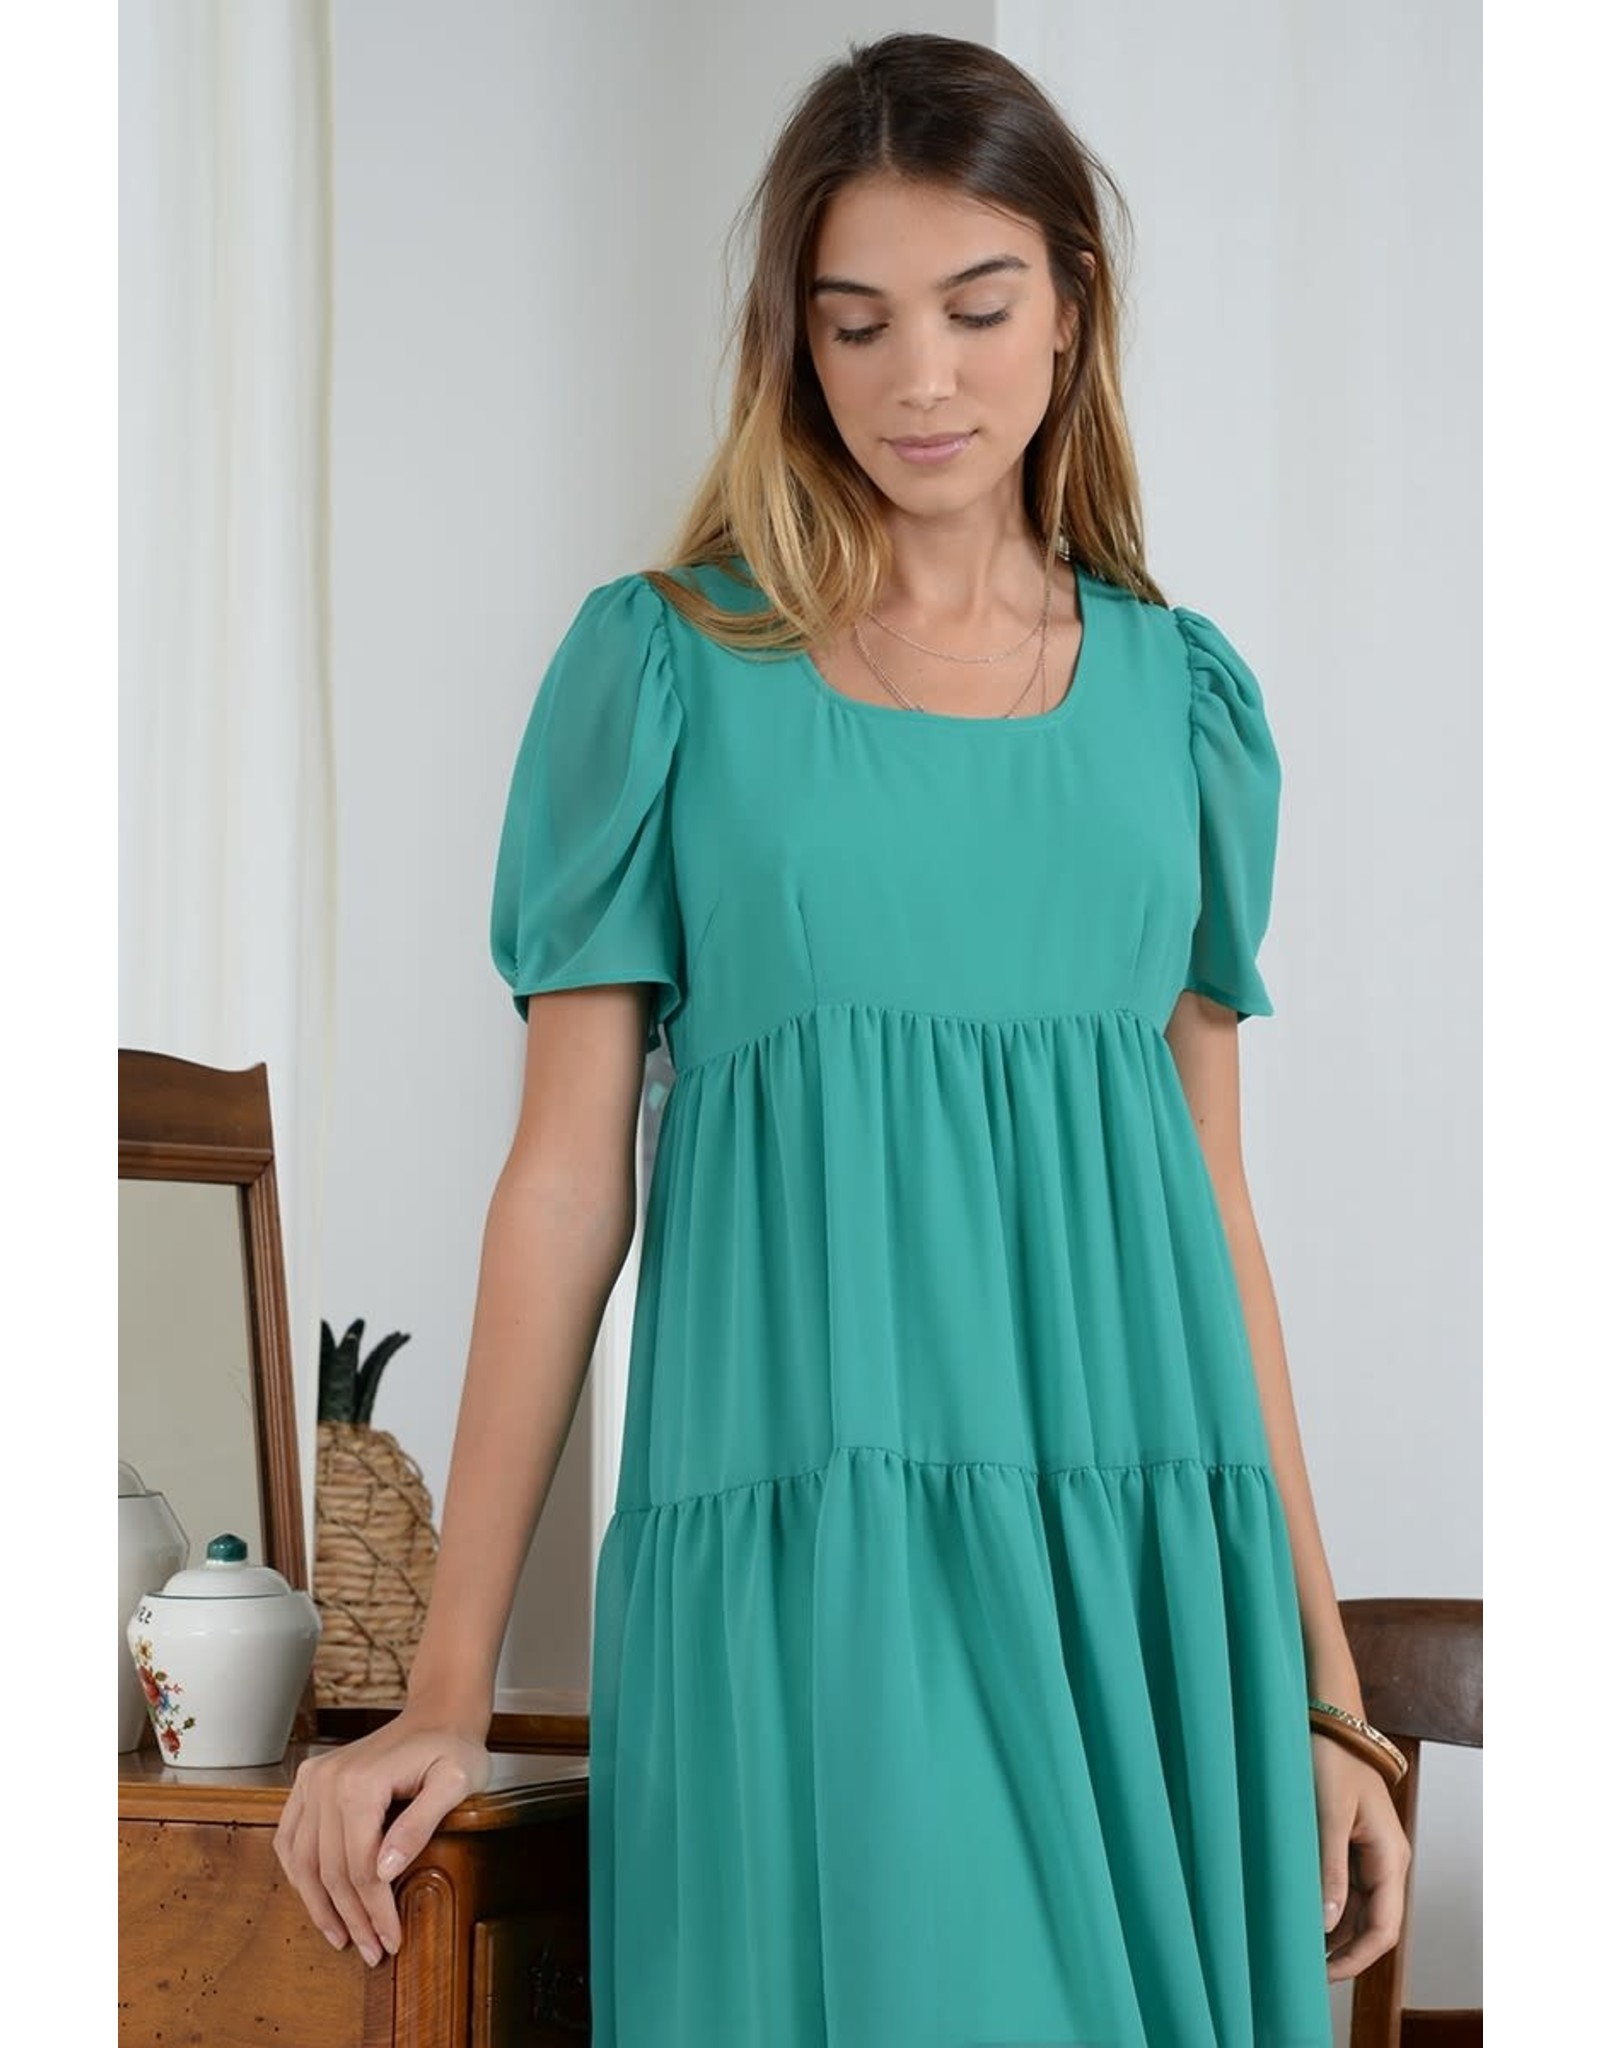 MLY - Neverland Dress